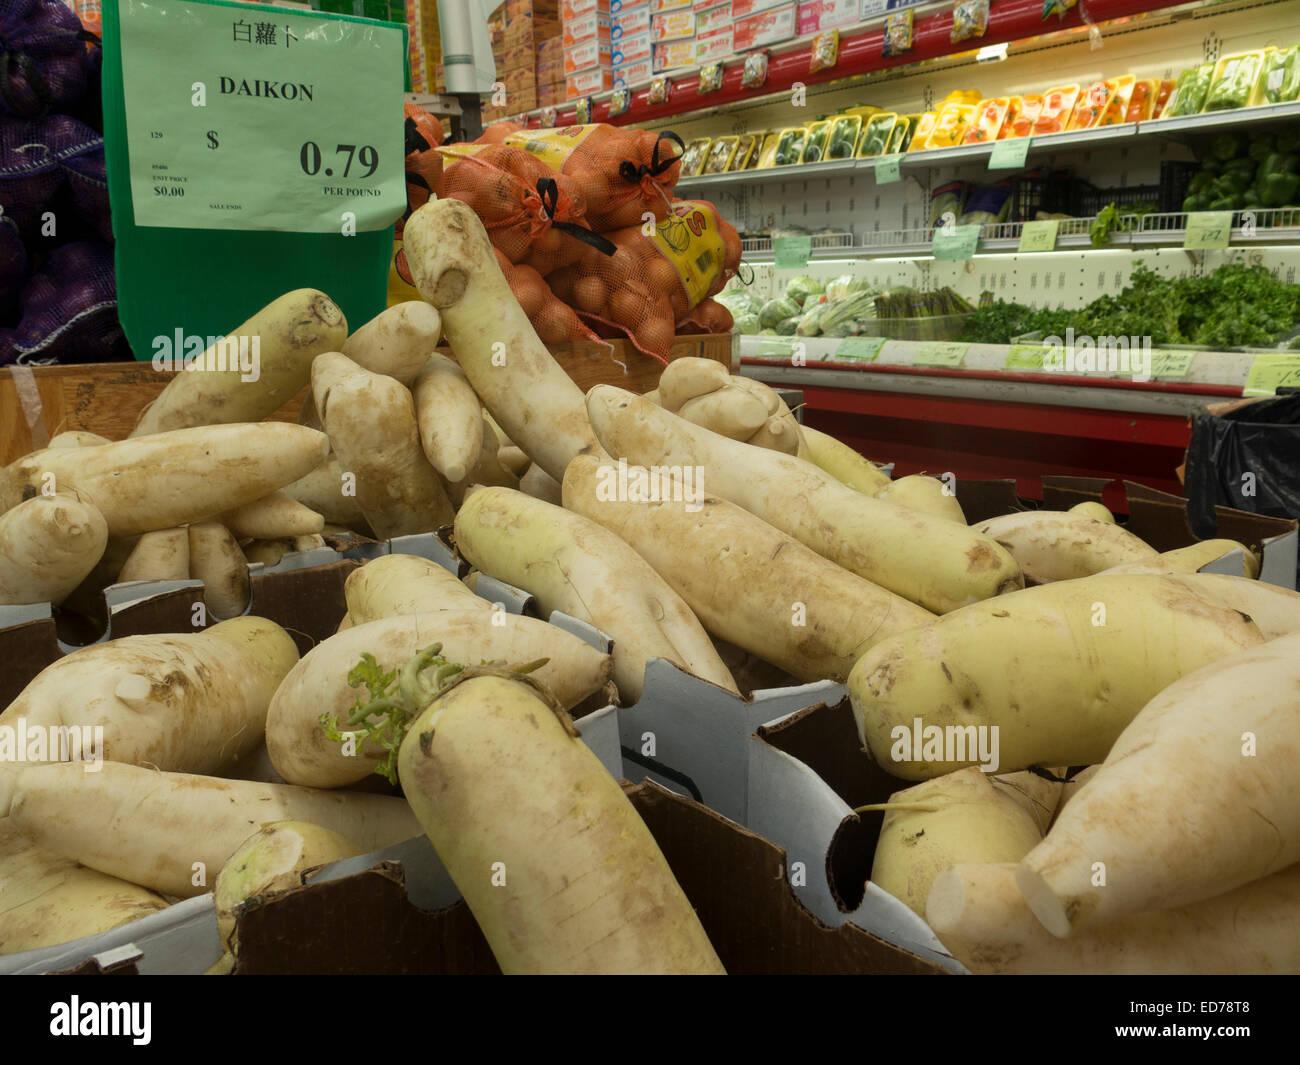 Asian Grocery Shelves Stock Photos & Asian Grocery Shelves Stock ...